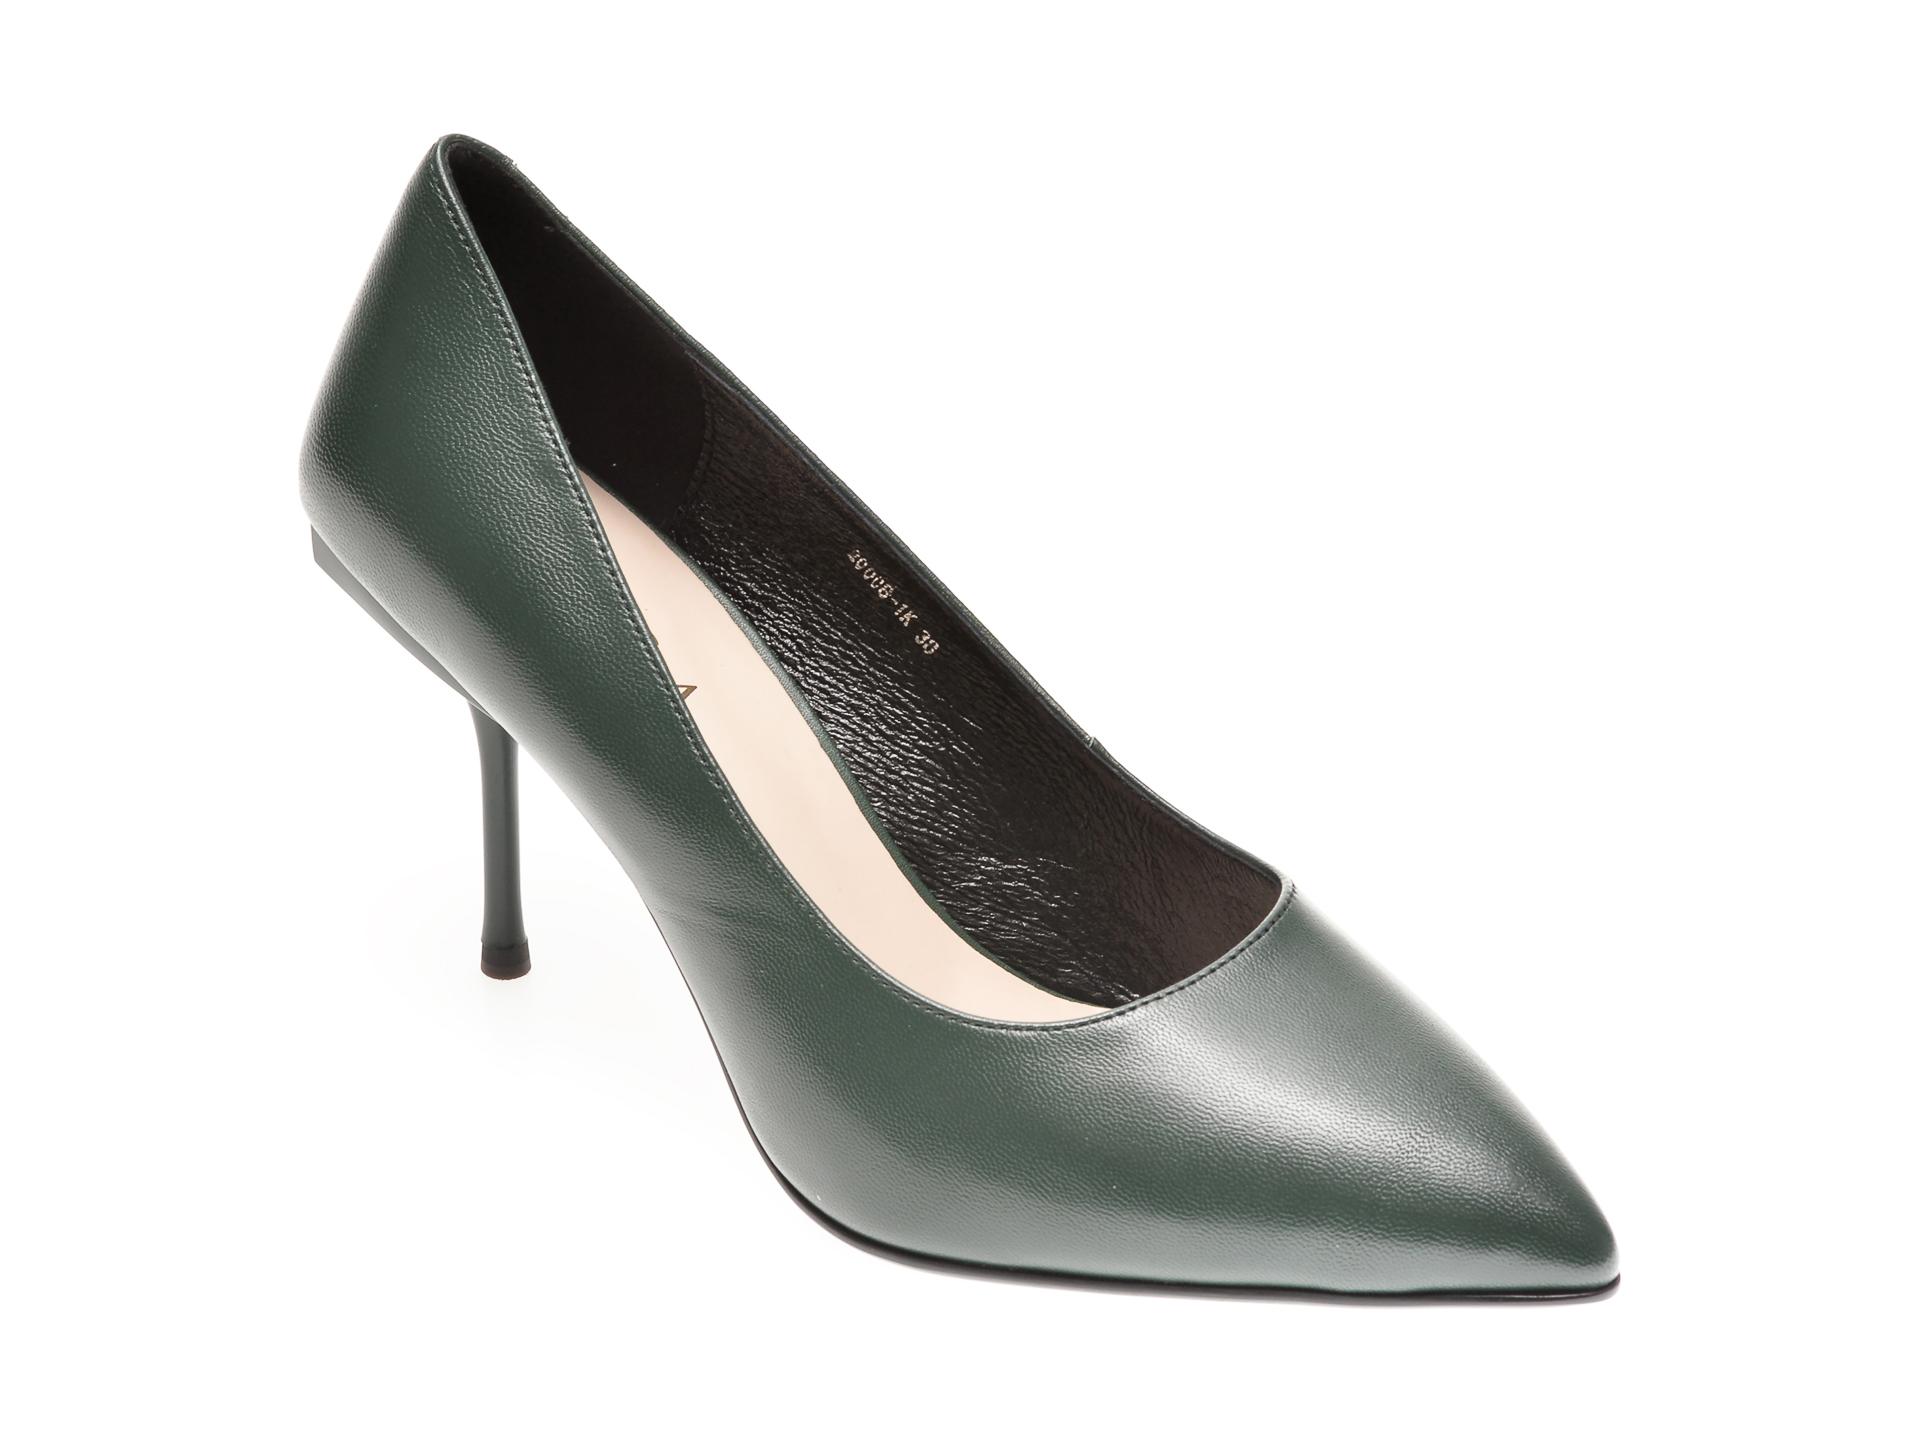 Pantofi EPICA verzi, 20008, din piele naturala imagine otter.ro